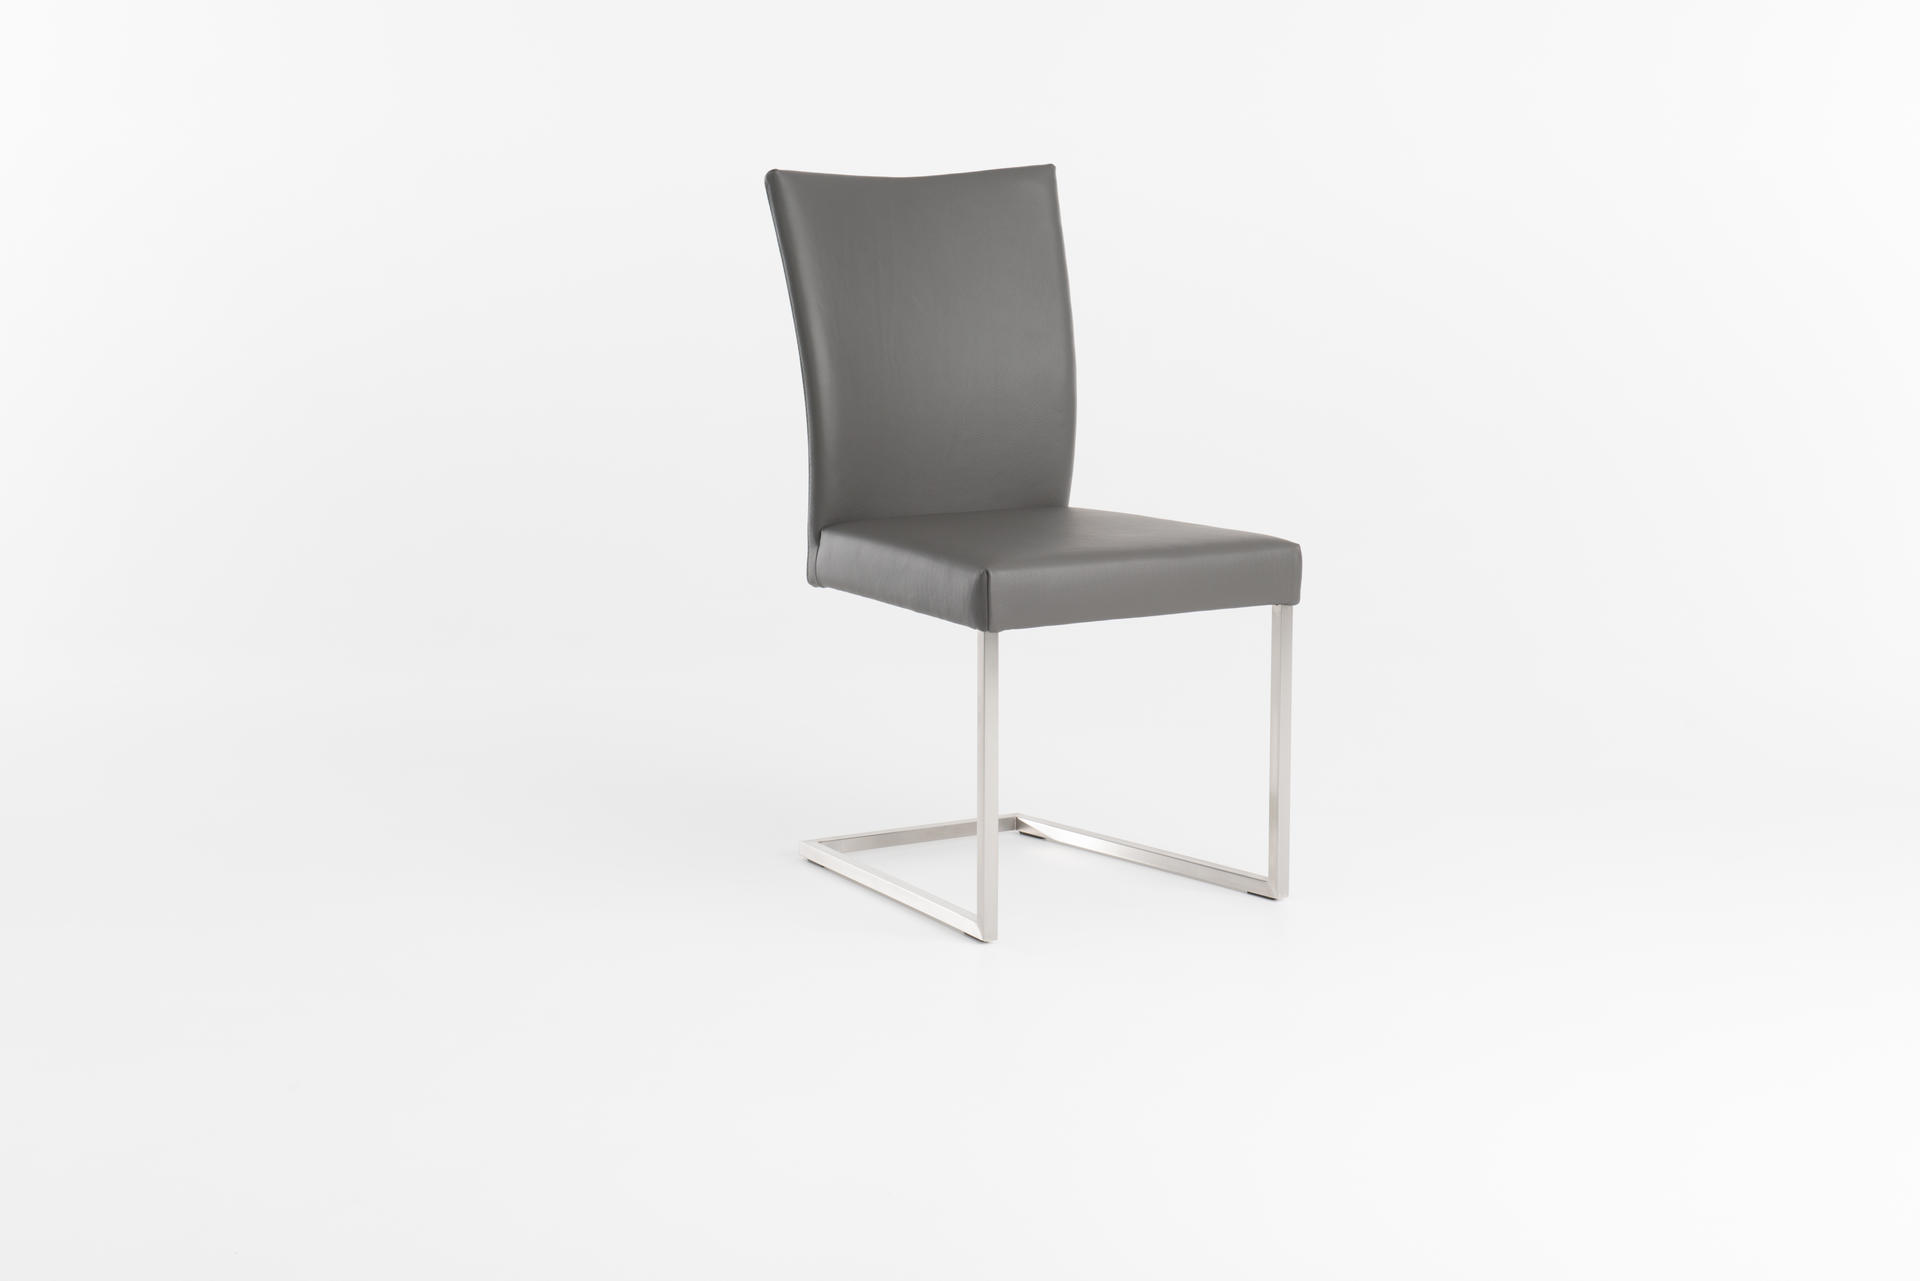 стул Misty, Bert Plantagie, фото 2